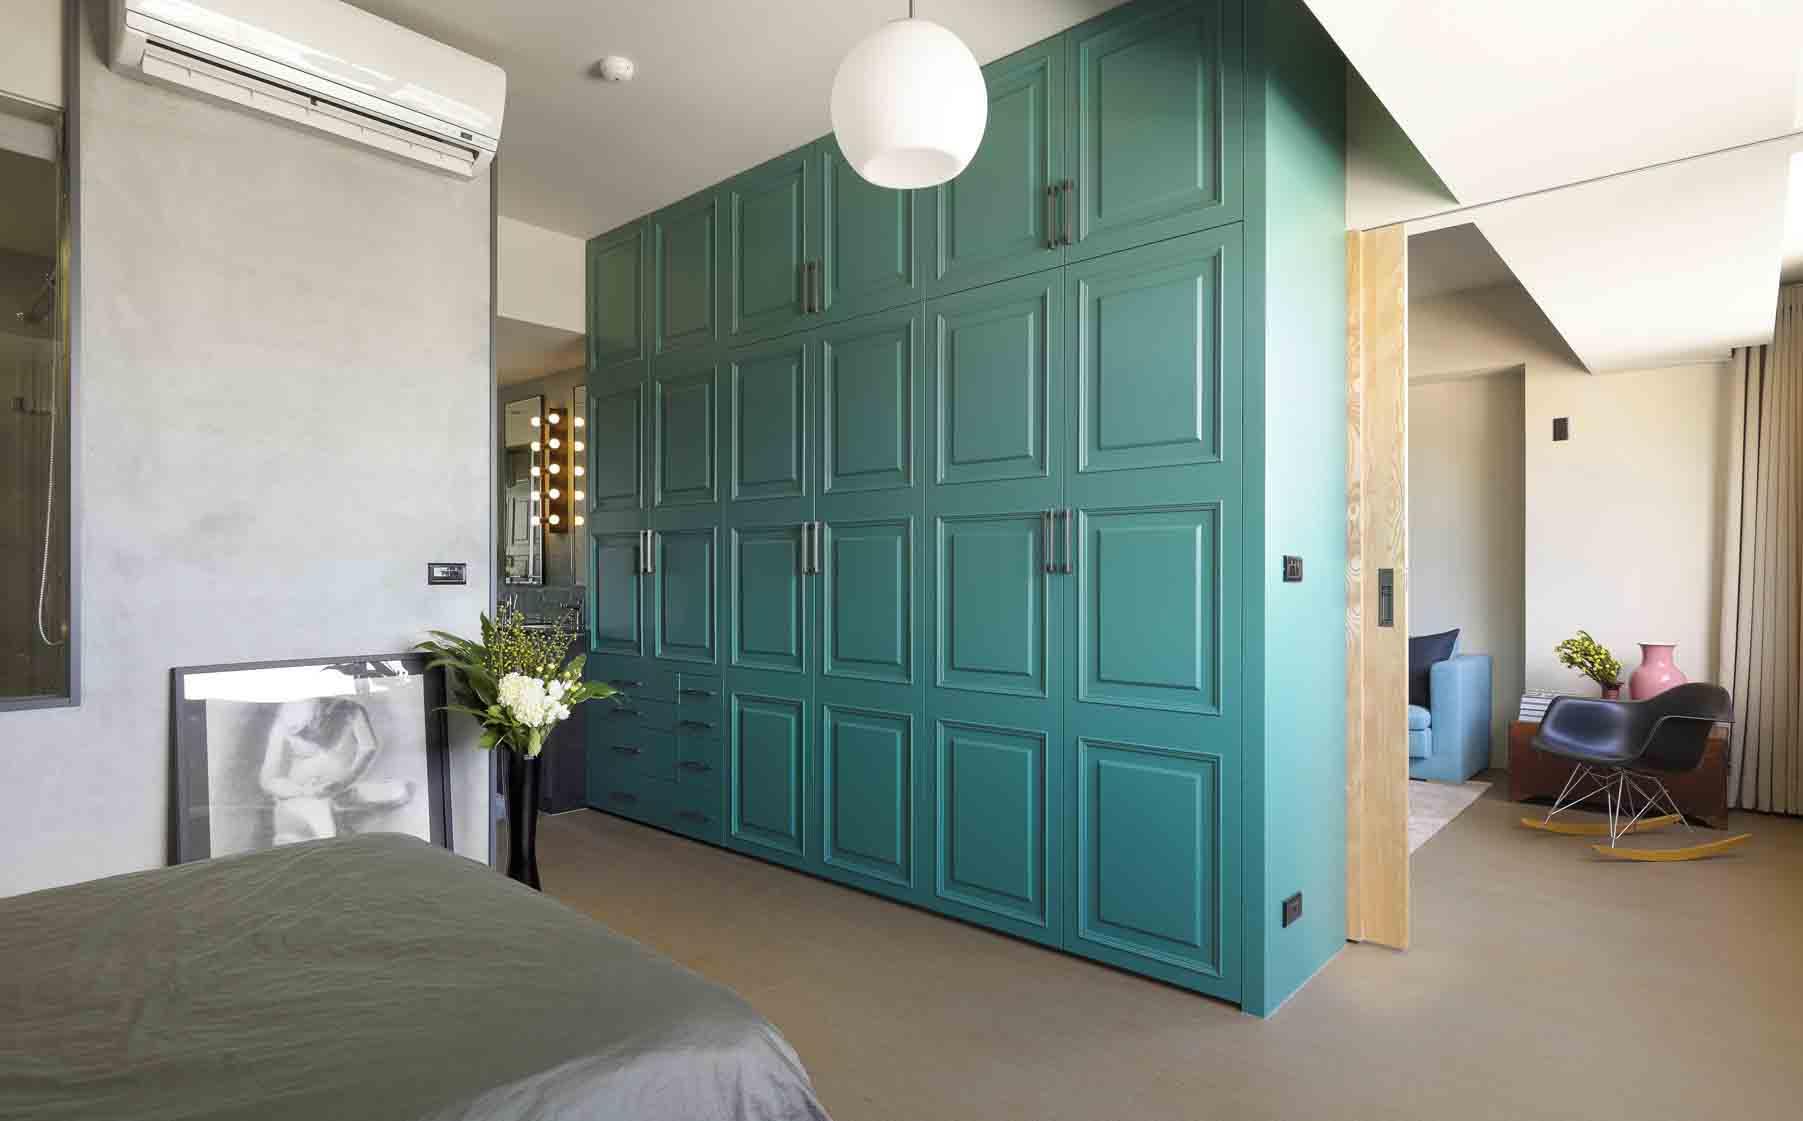 20 Bewitching Bedroom Storage Ideas